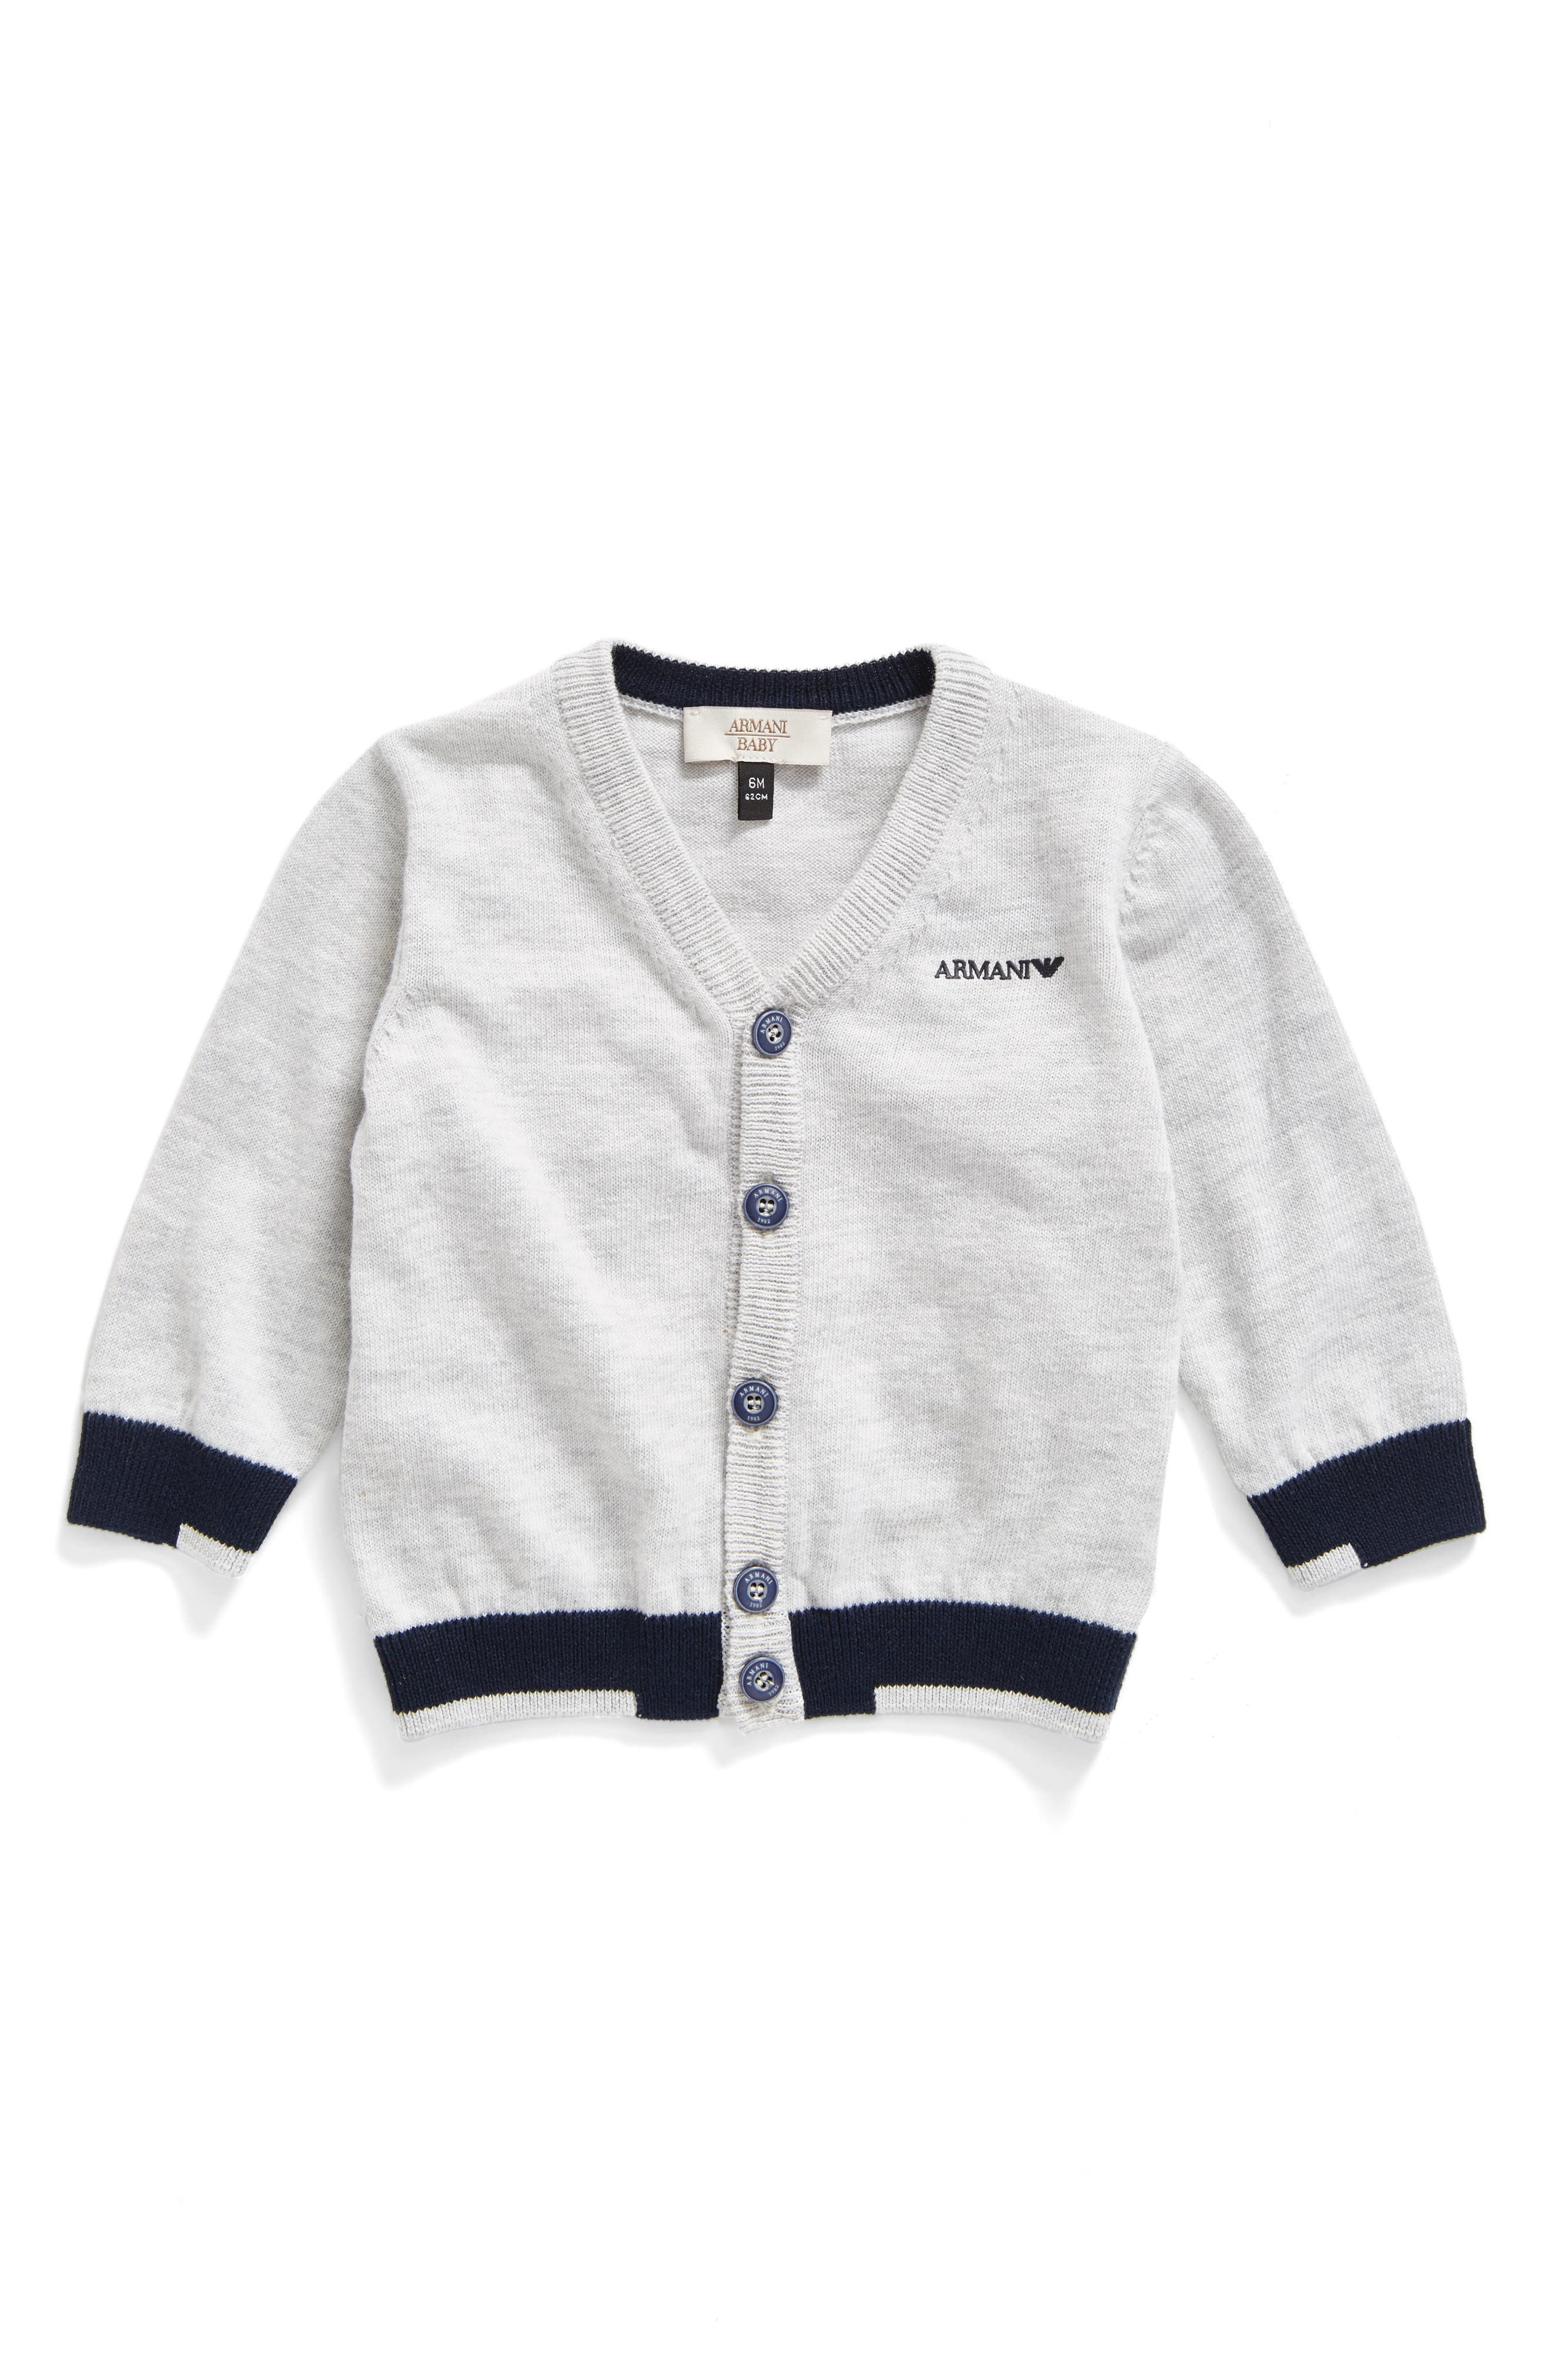 Alternate Image 1 Selected - Armani Junior Colorblock Cardigan (Baby Boys)